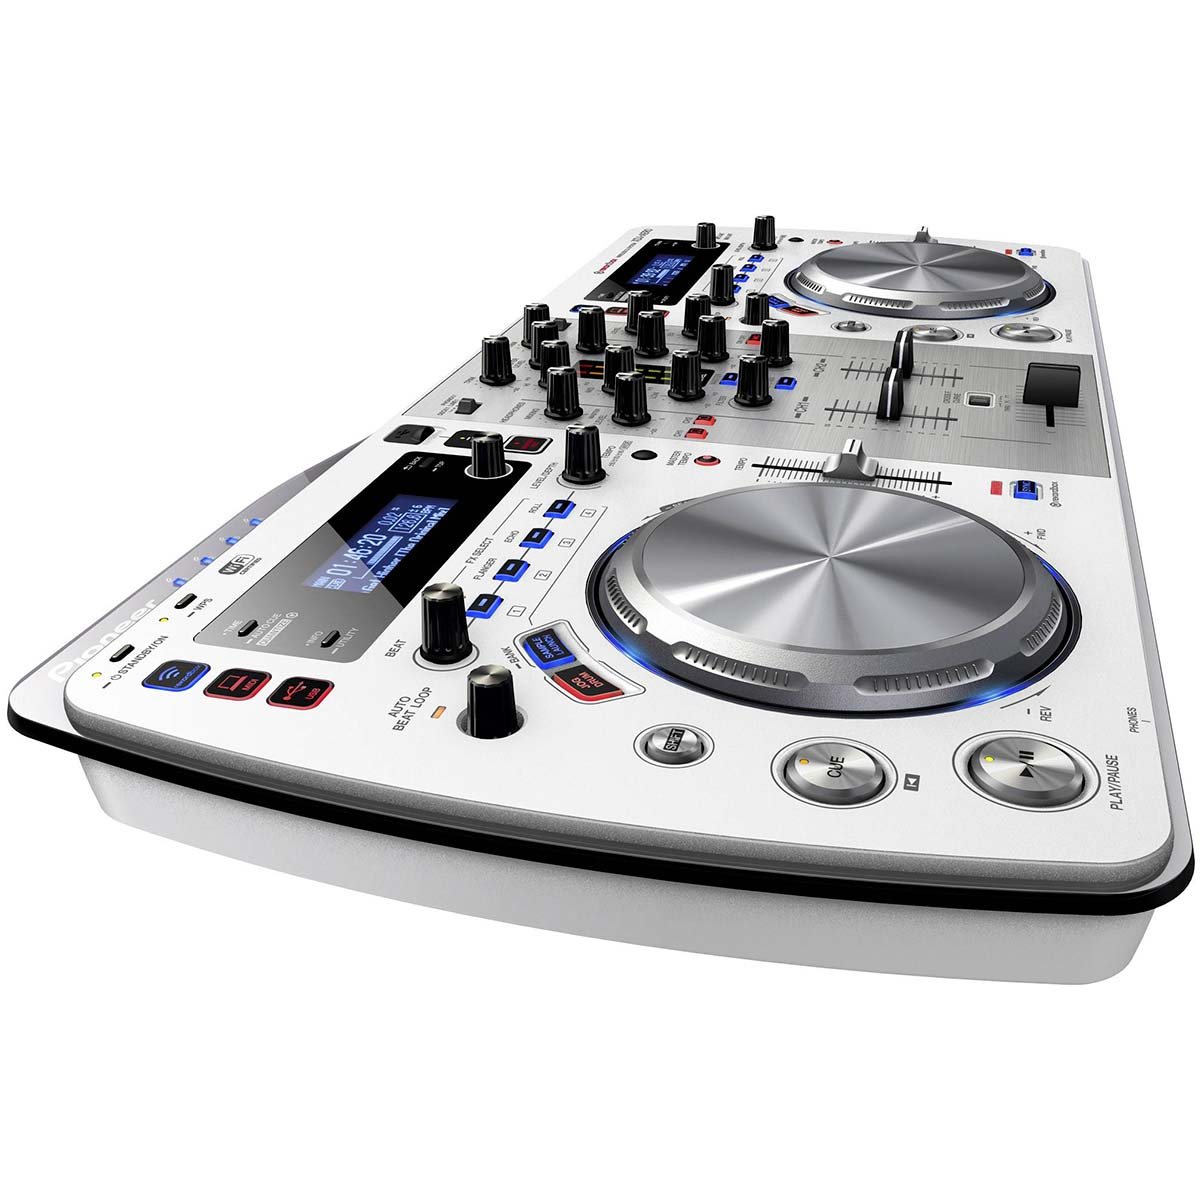 XDJAERO - Controladora DJ c/ Wireless XDJ AERO Branca - Pioneer